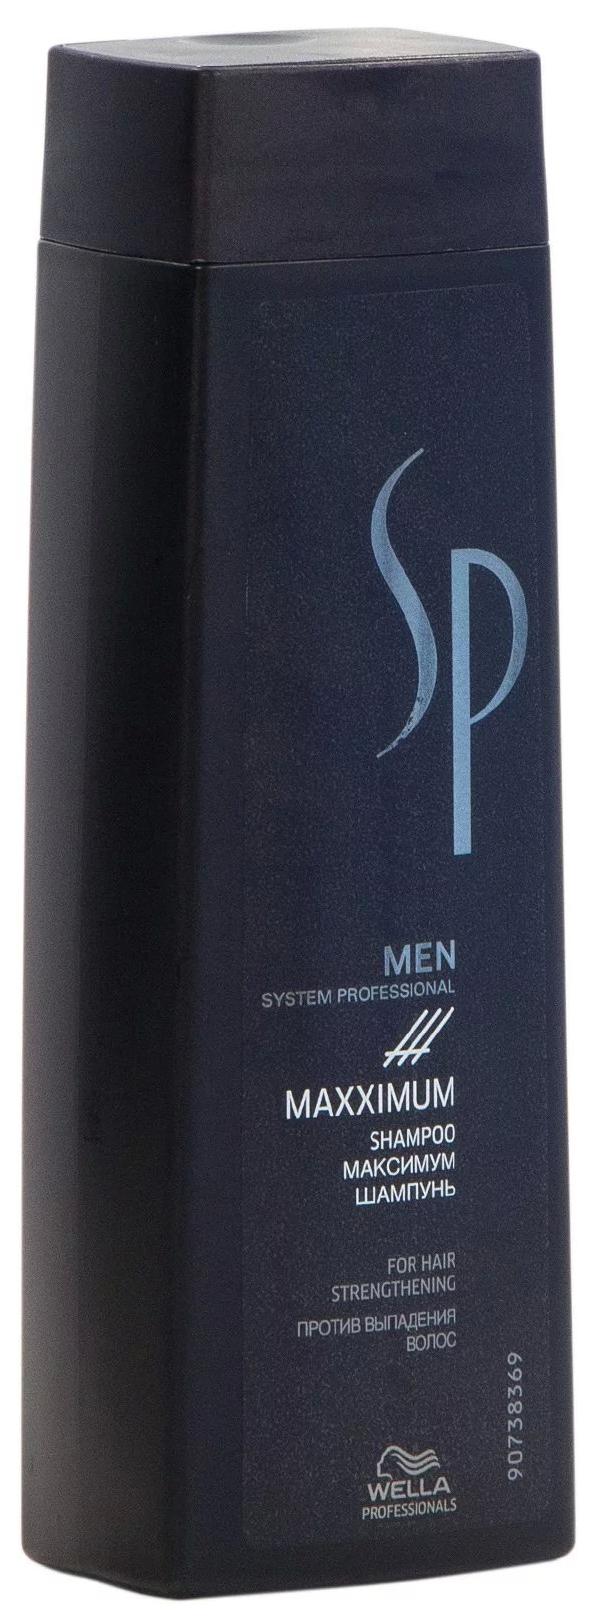 WELLA SP SP MEN MAXIMUM SHAMPOO